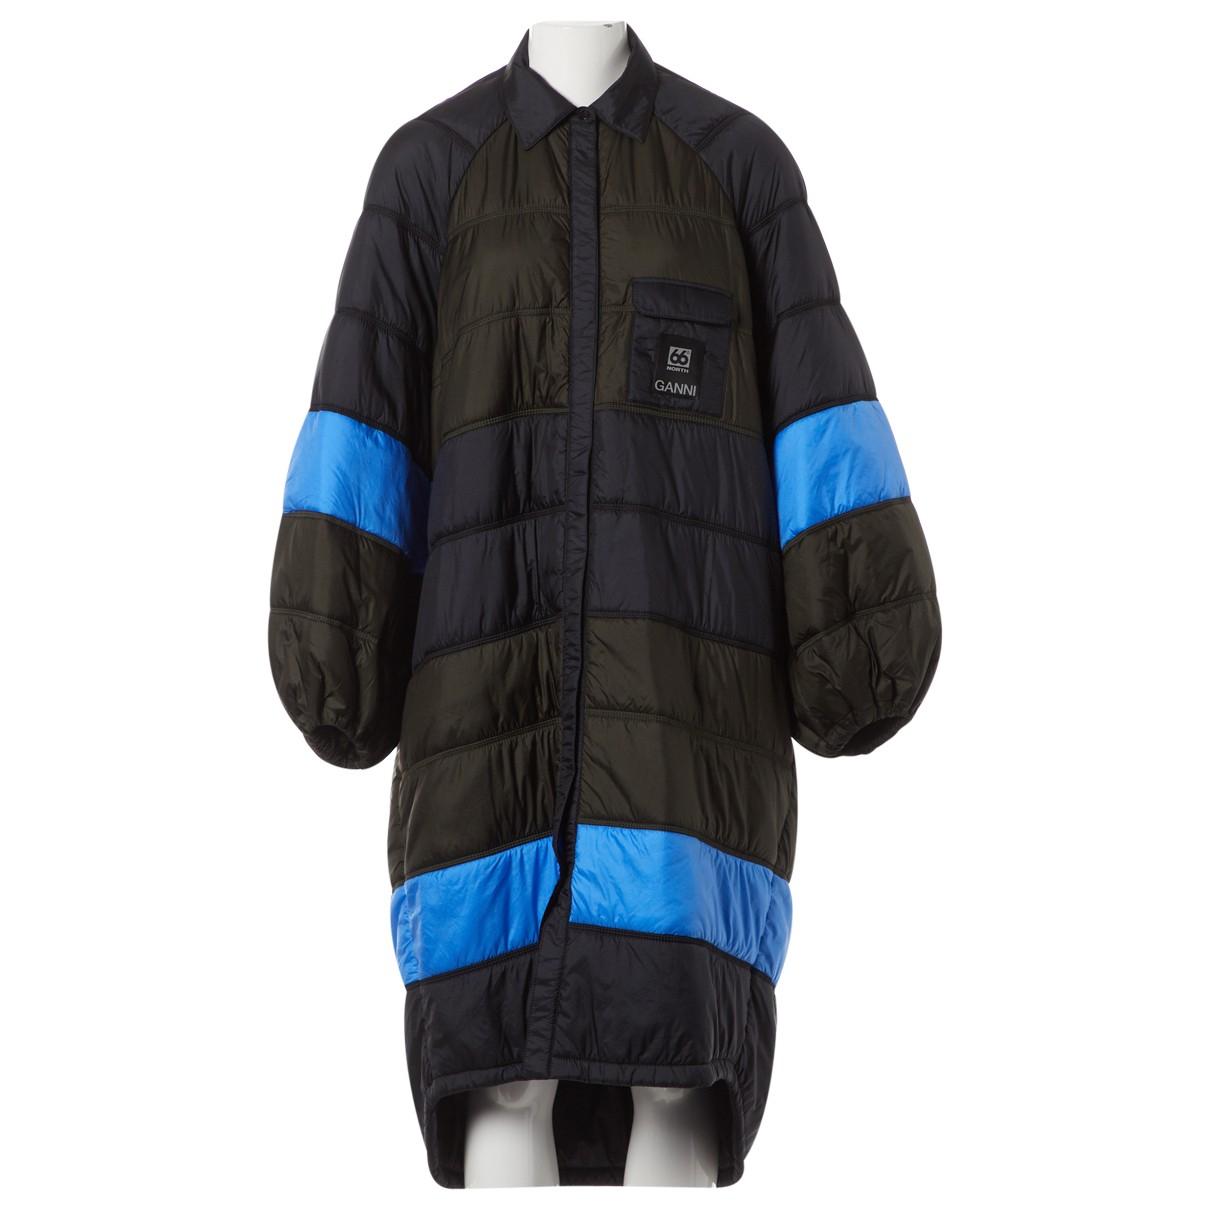 Ganni Fall Winter 2019 Black coat for Women M International